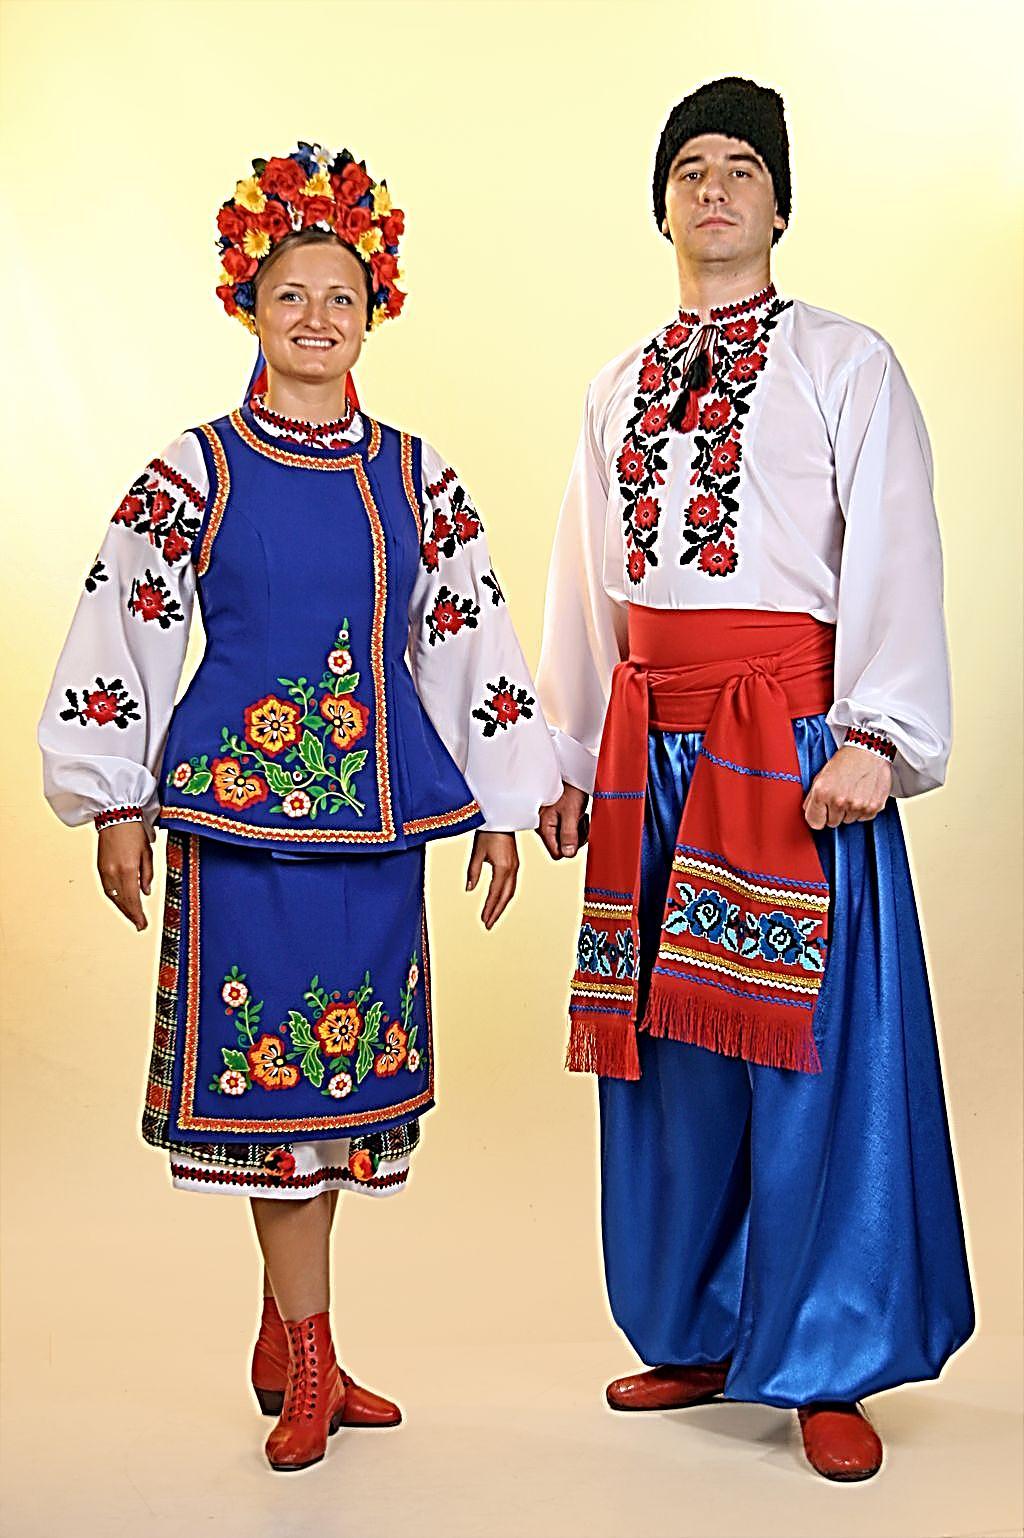 http://www.klass39.ru/wp-content/uploads/2013/05/cen-809-1.jpg